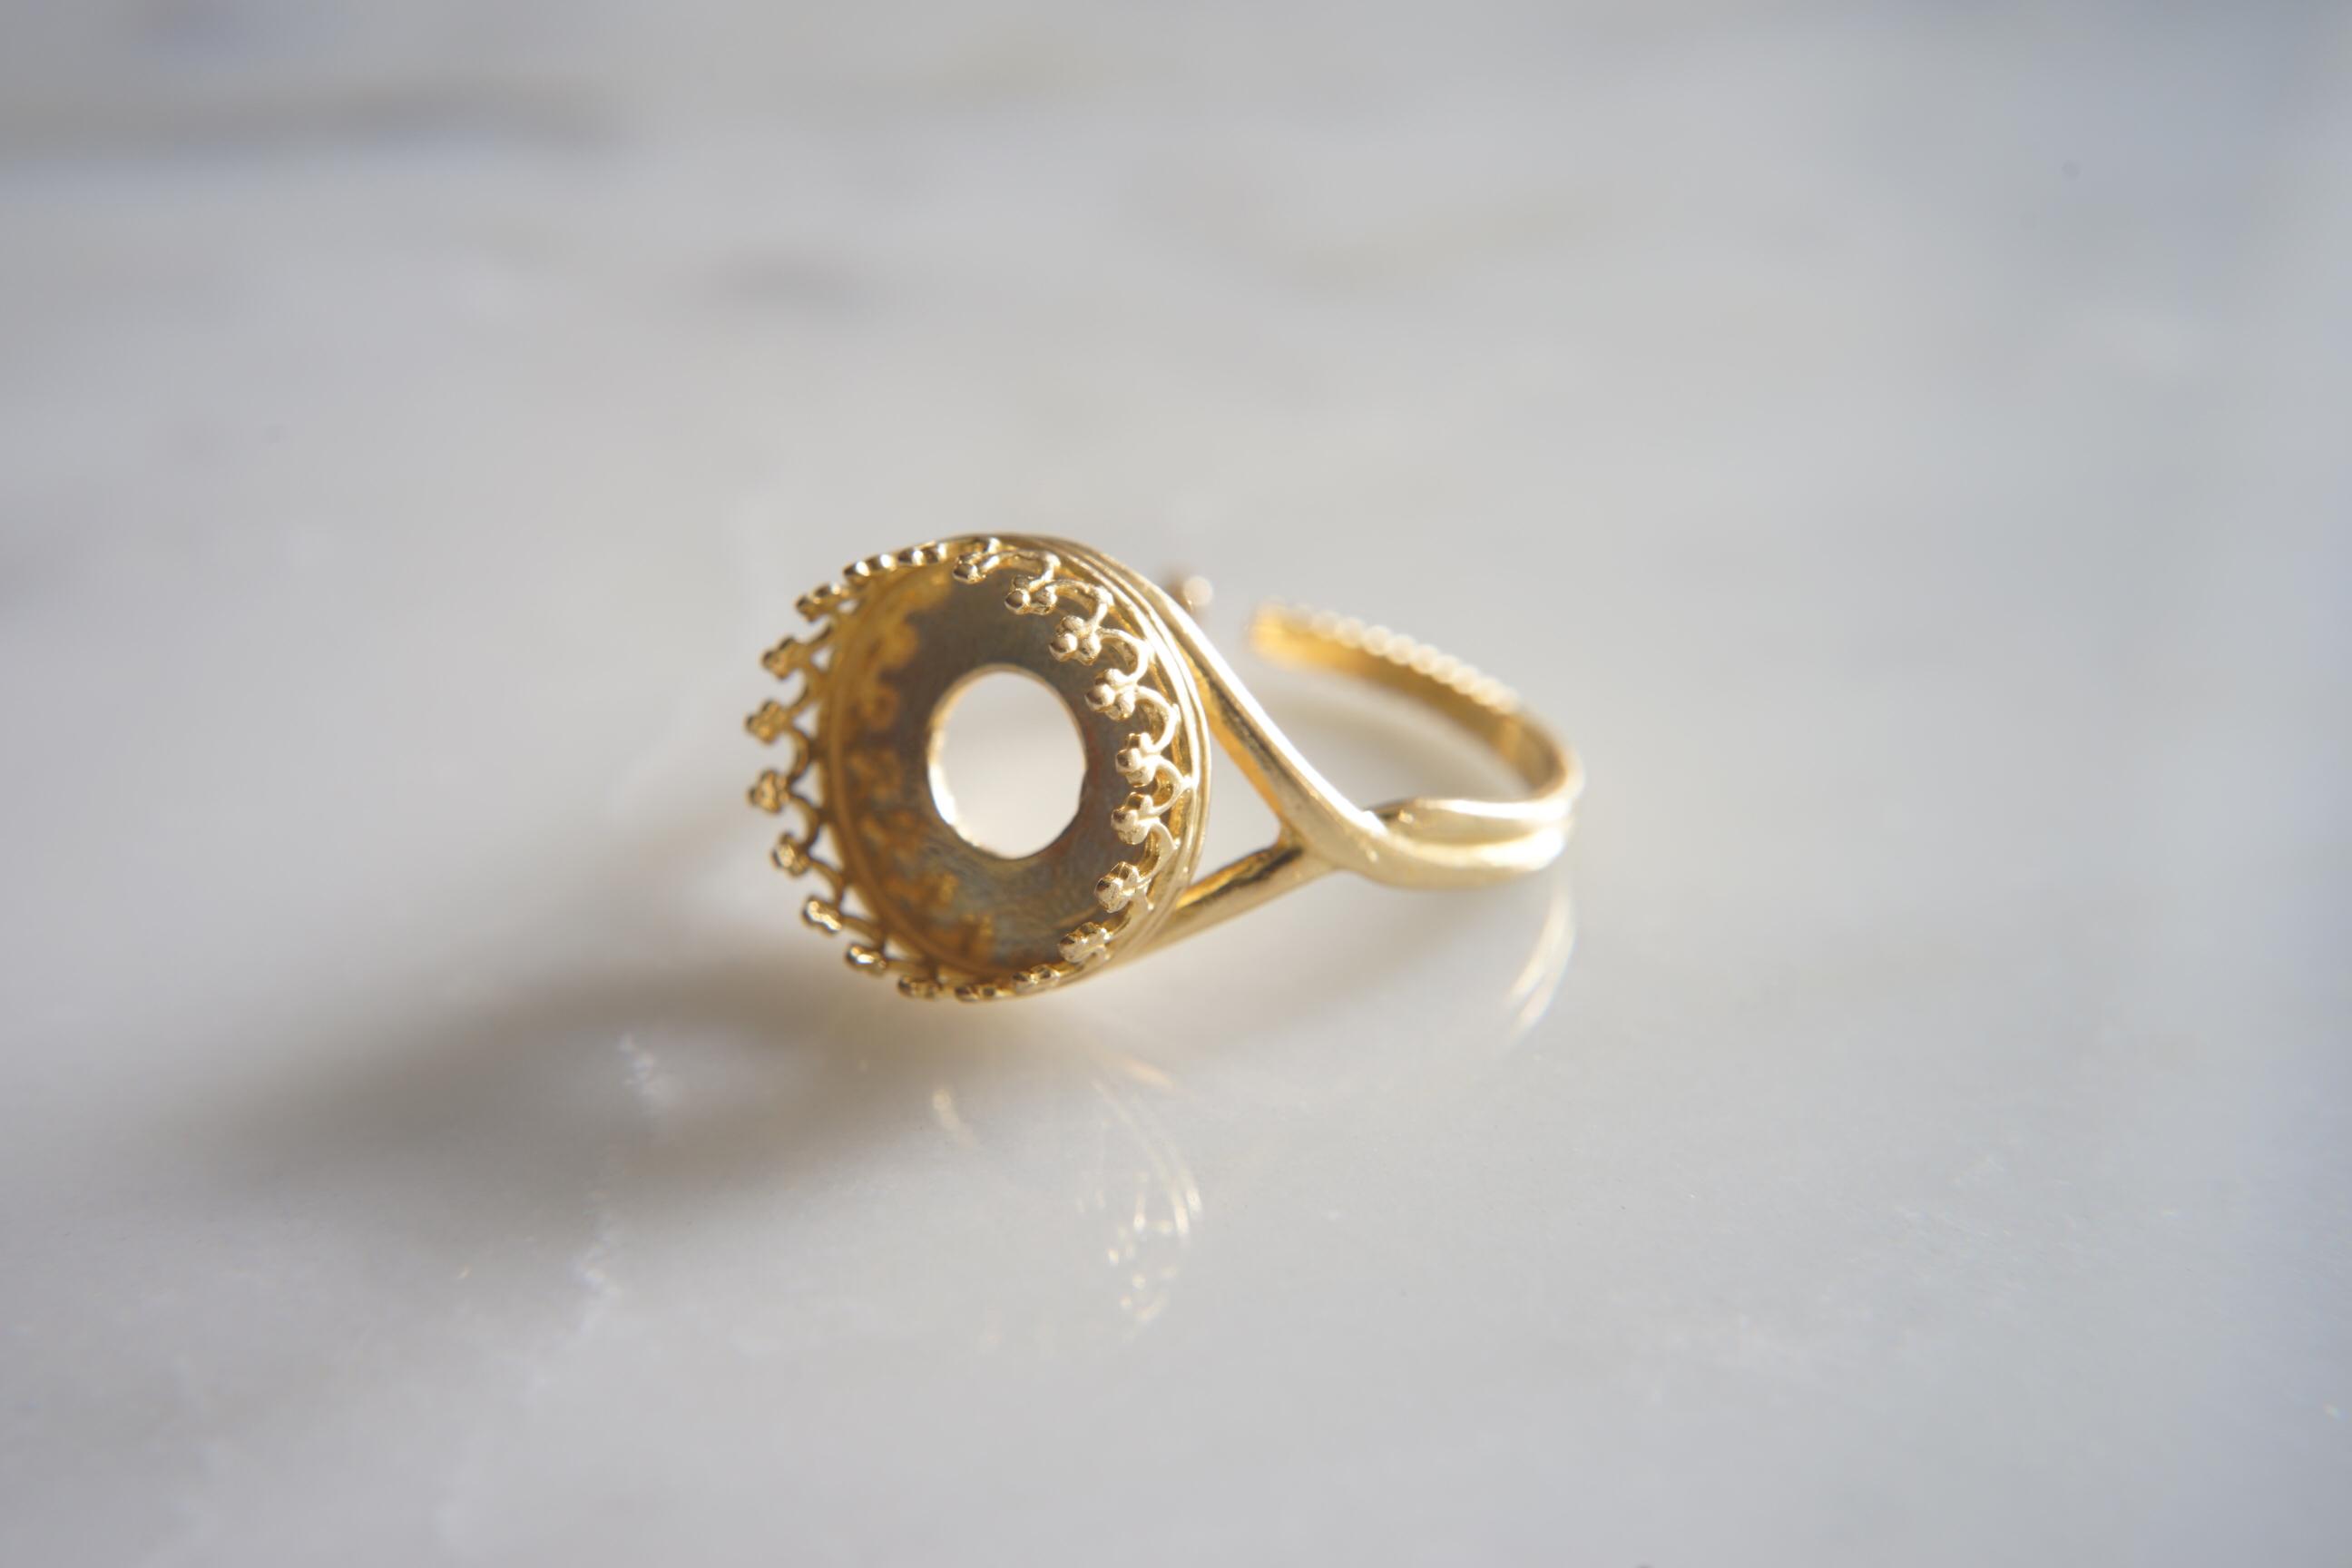 真鍮(ブラス)製 空枠指輪